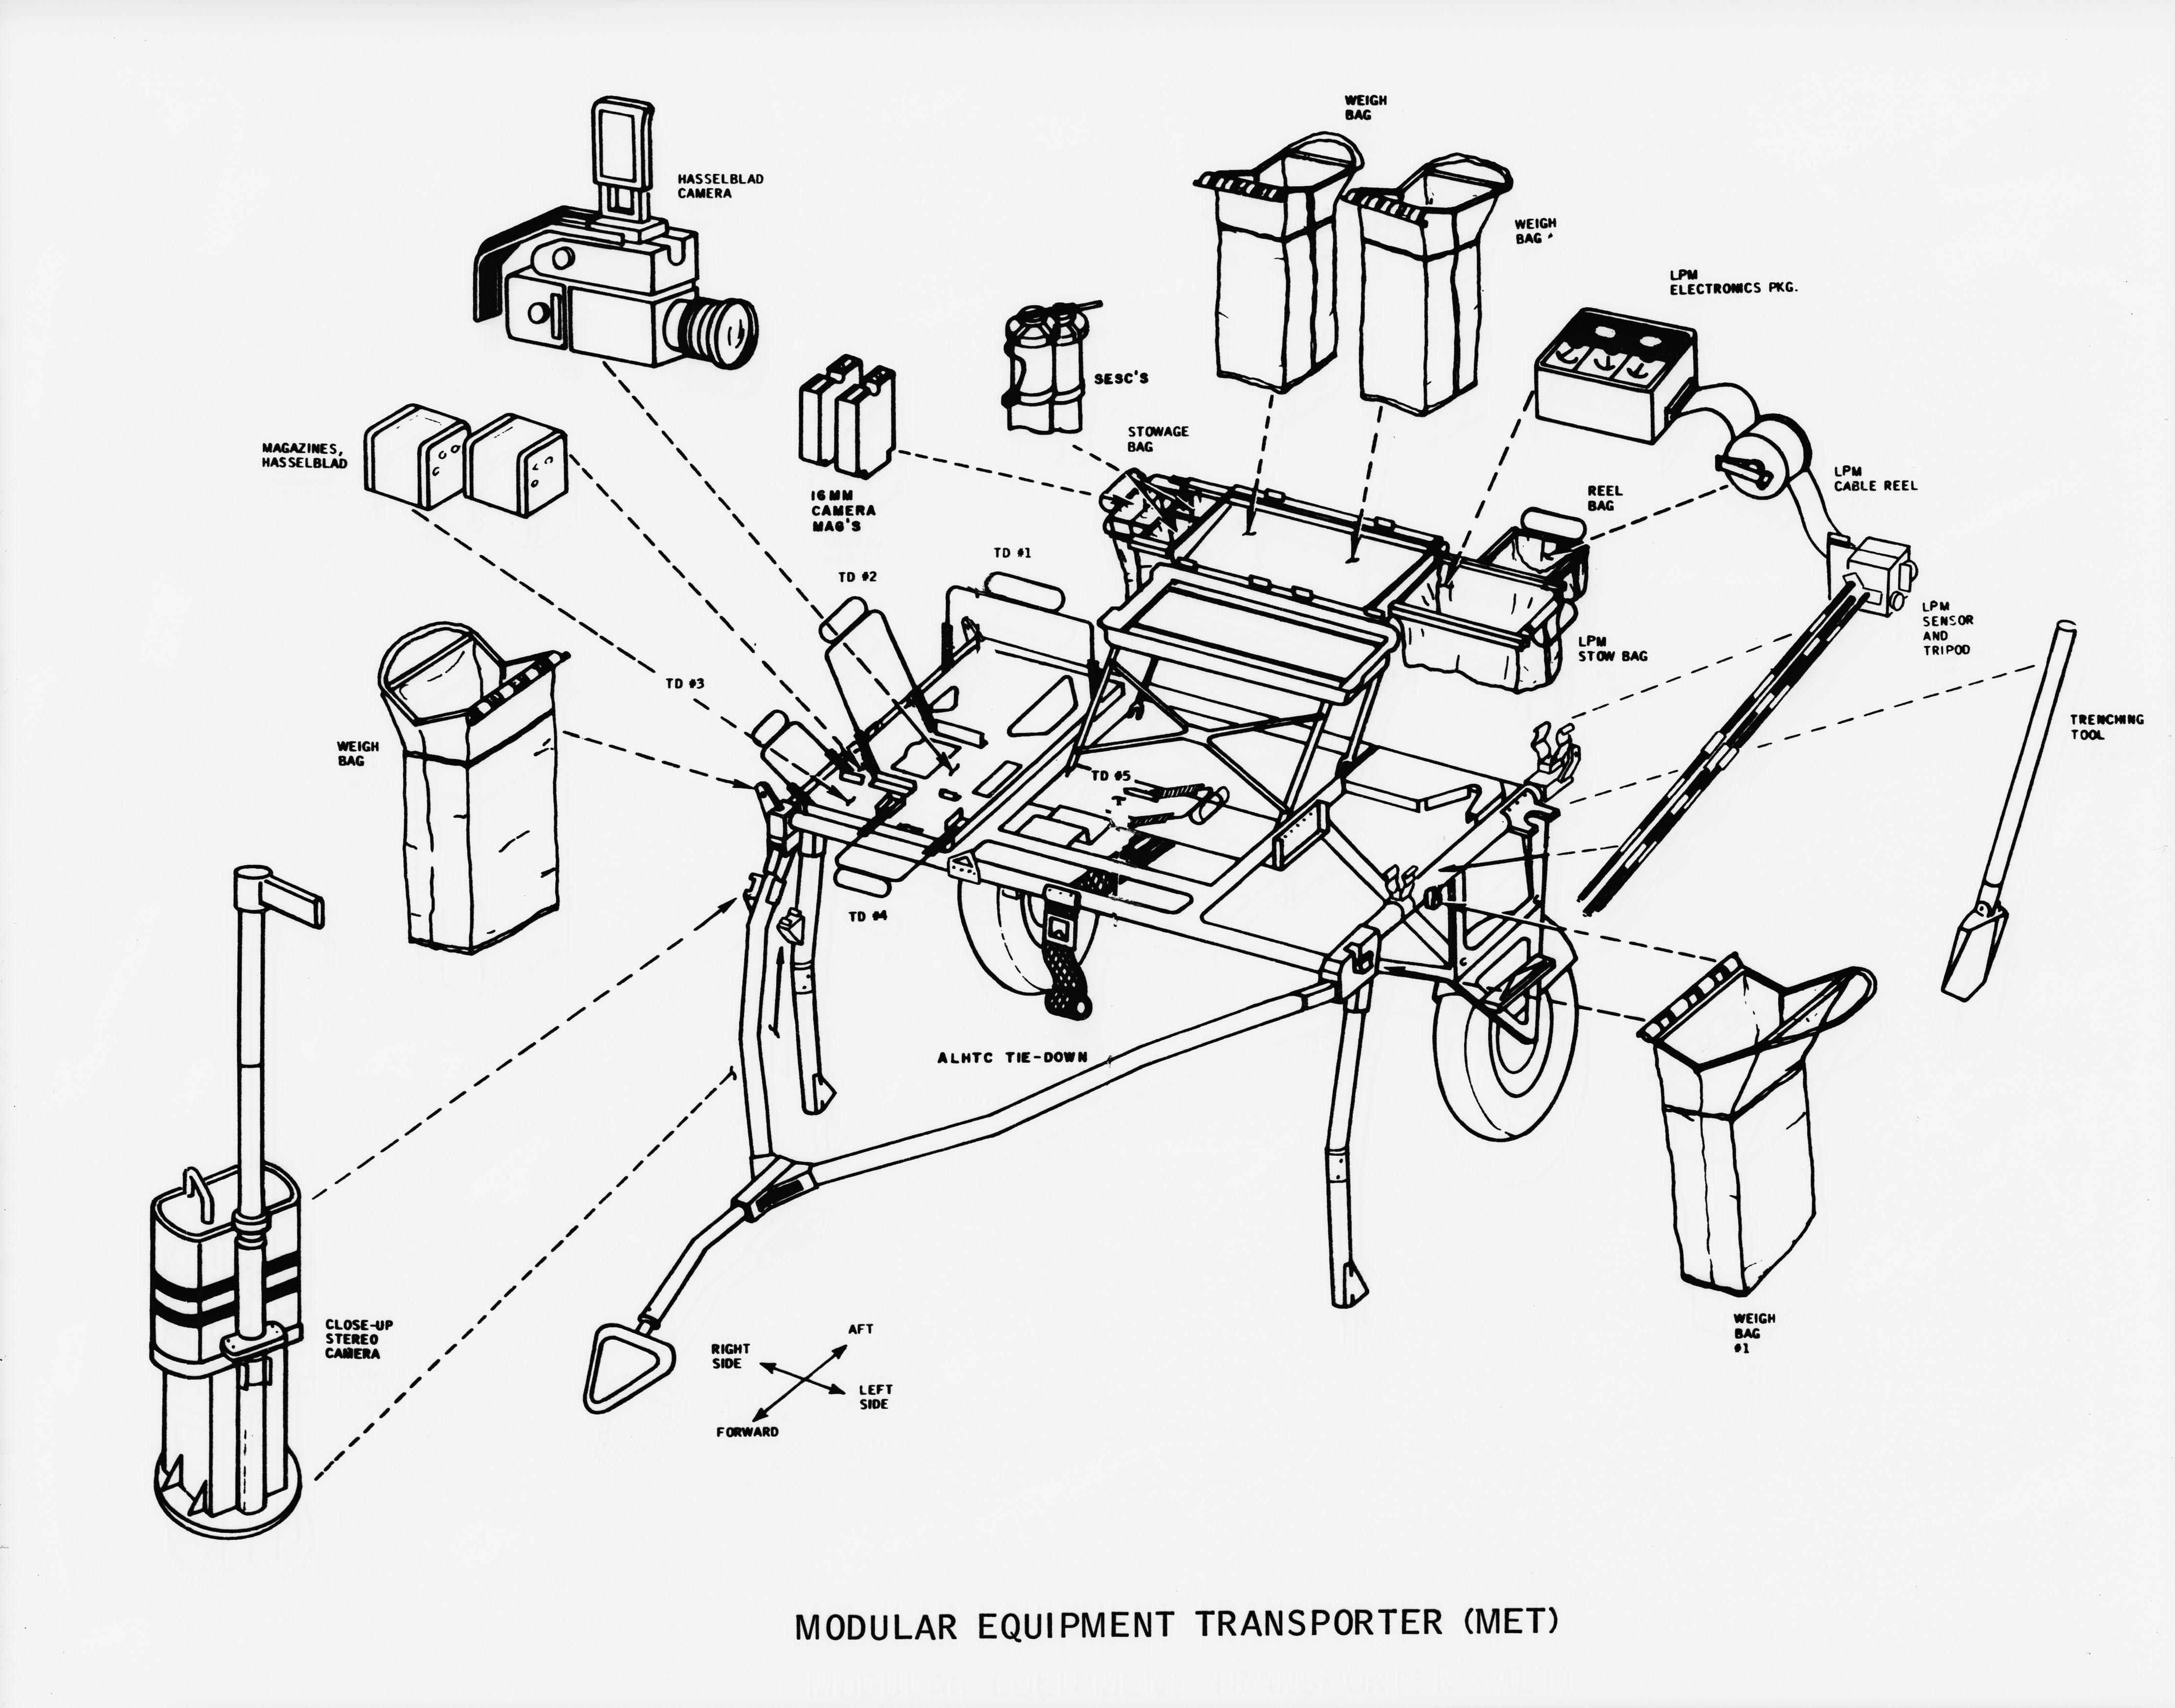 File:Modular-Equipment-Transporter.jpg - Wikipedia